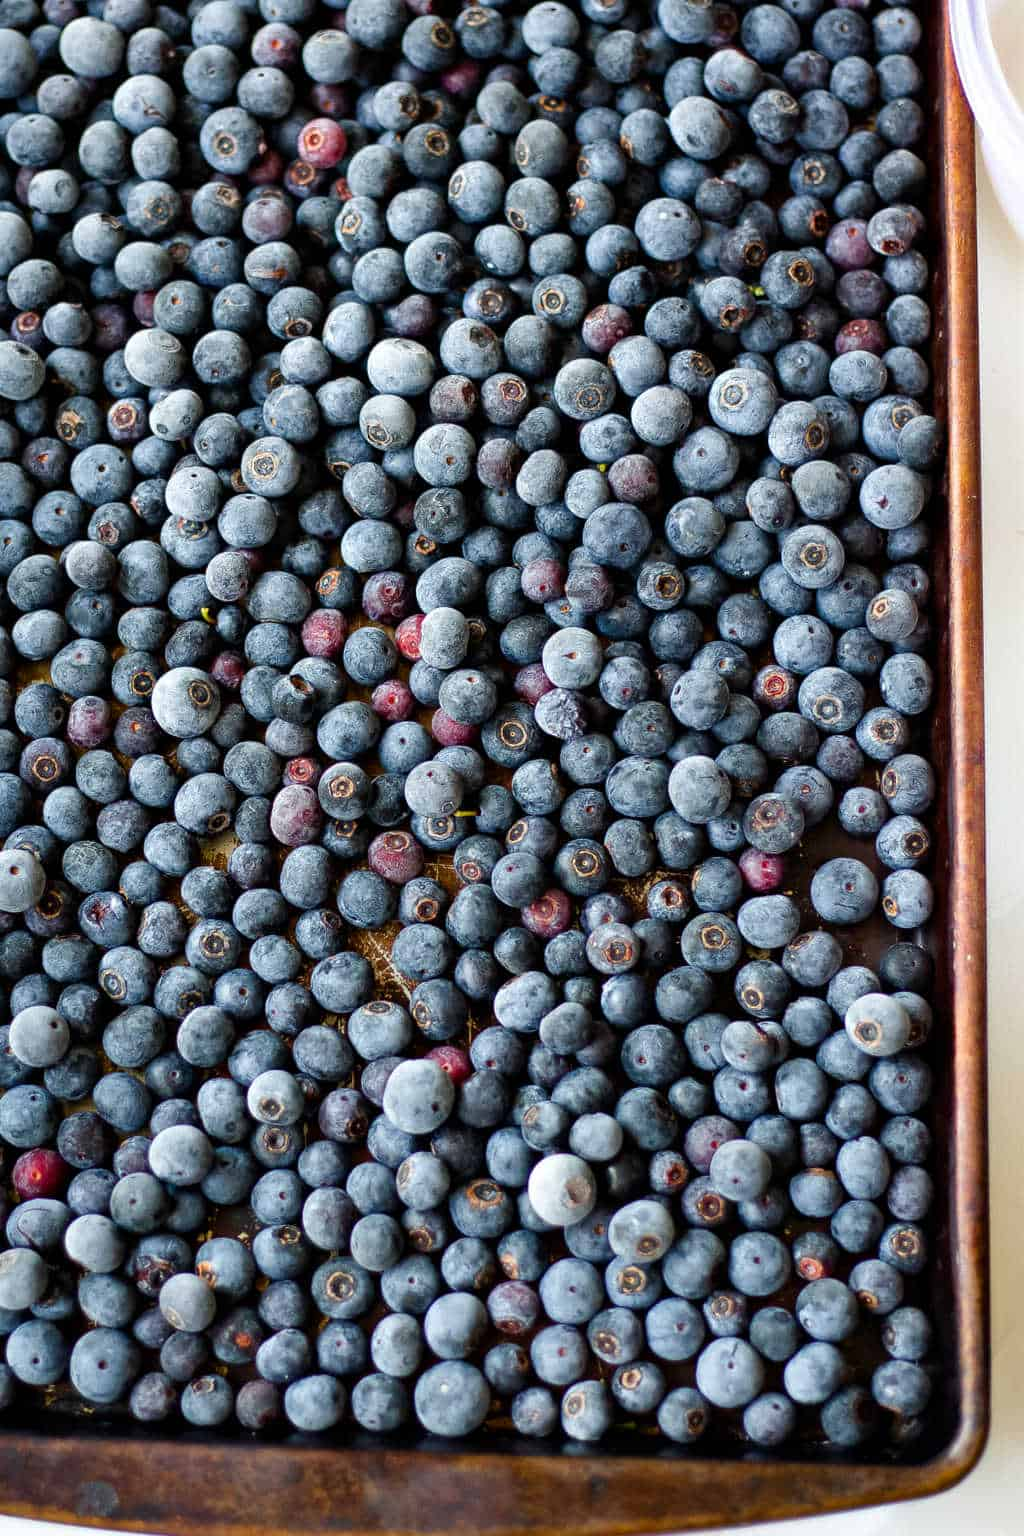 frozen blueberries on a baking sheet